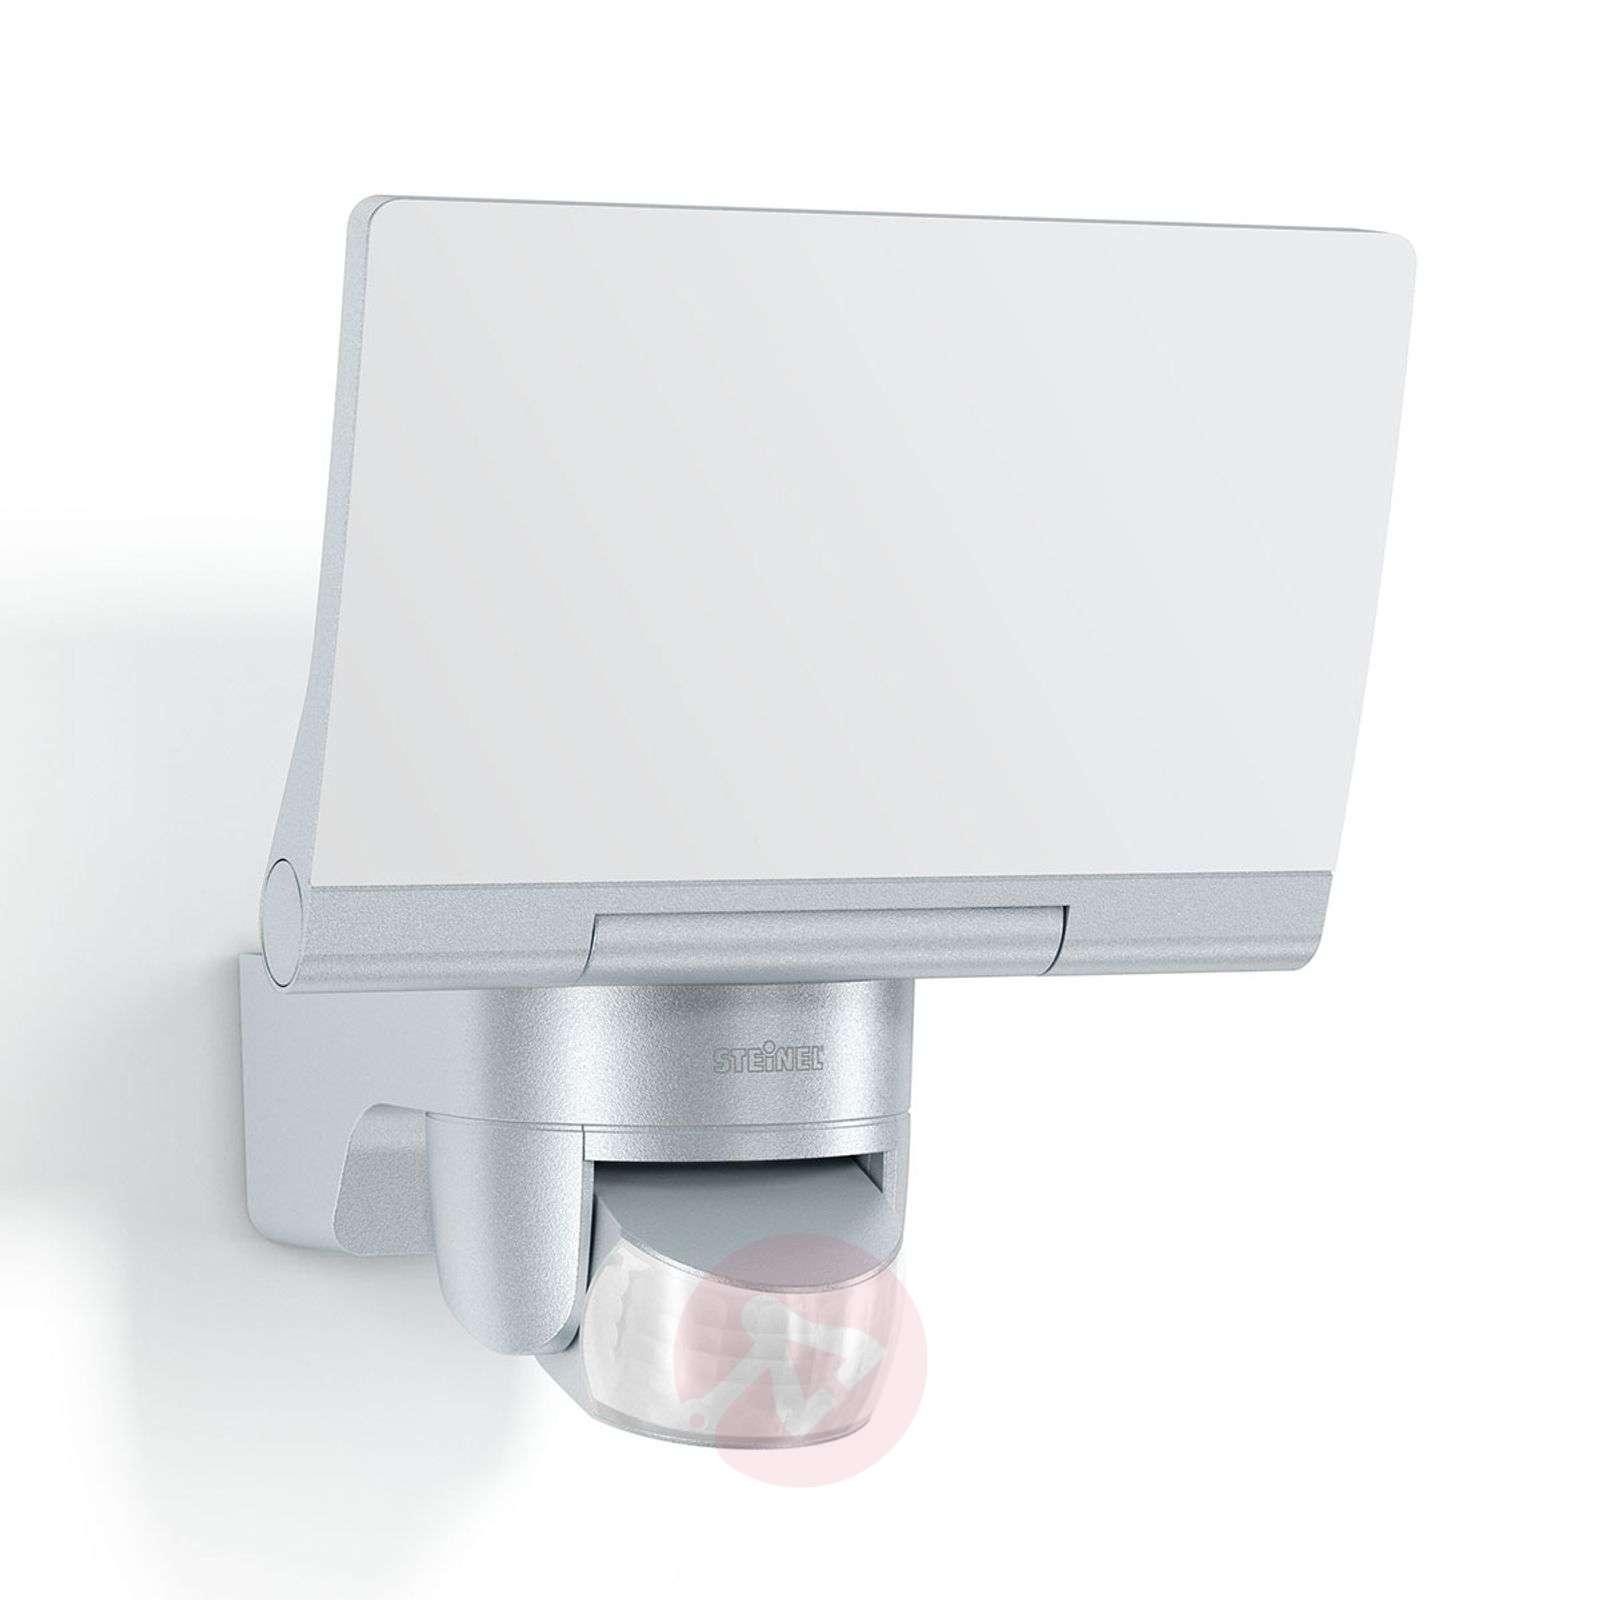 STEINEL XLED Home 2 Smart Friends LED spotlight-8505741X-02